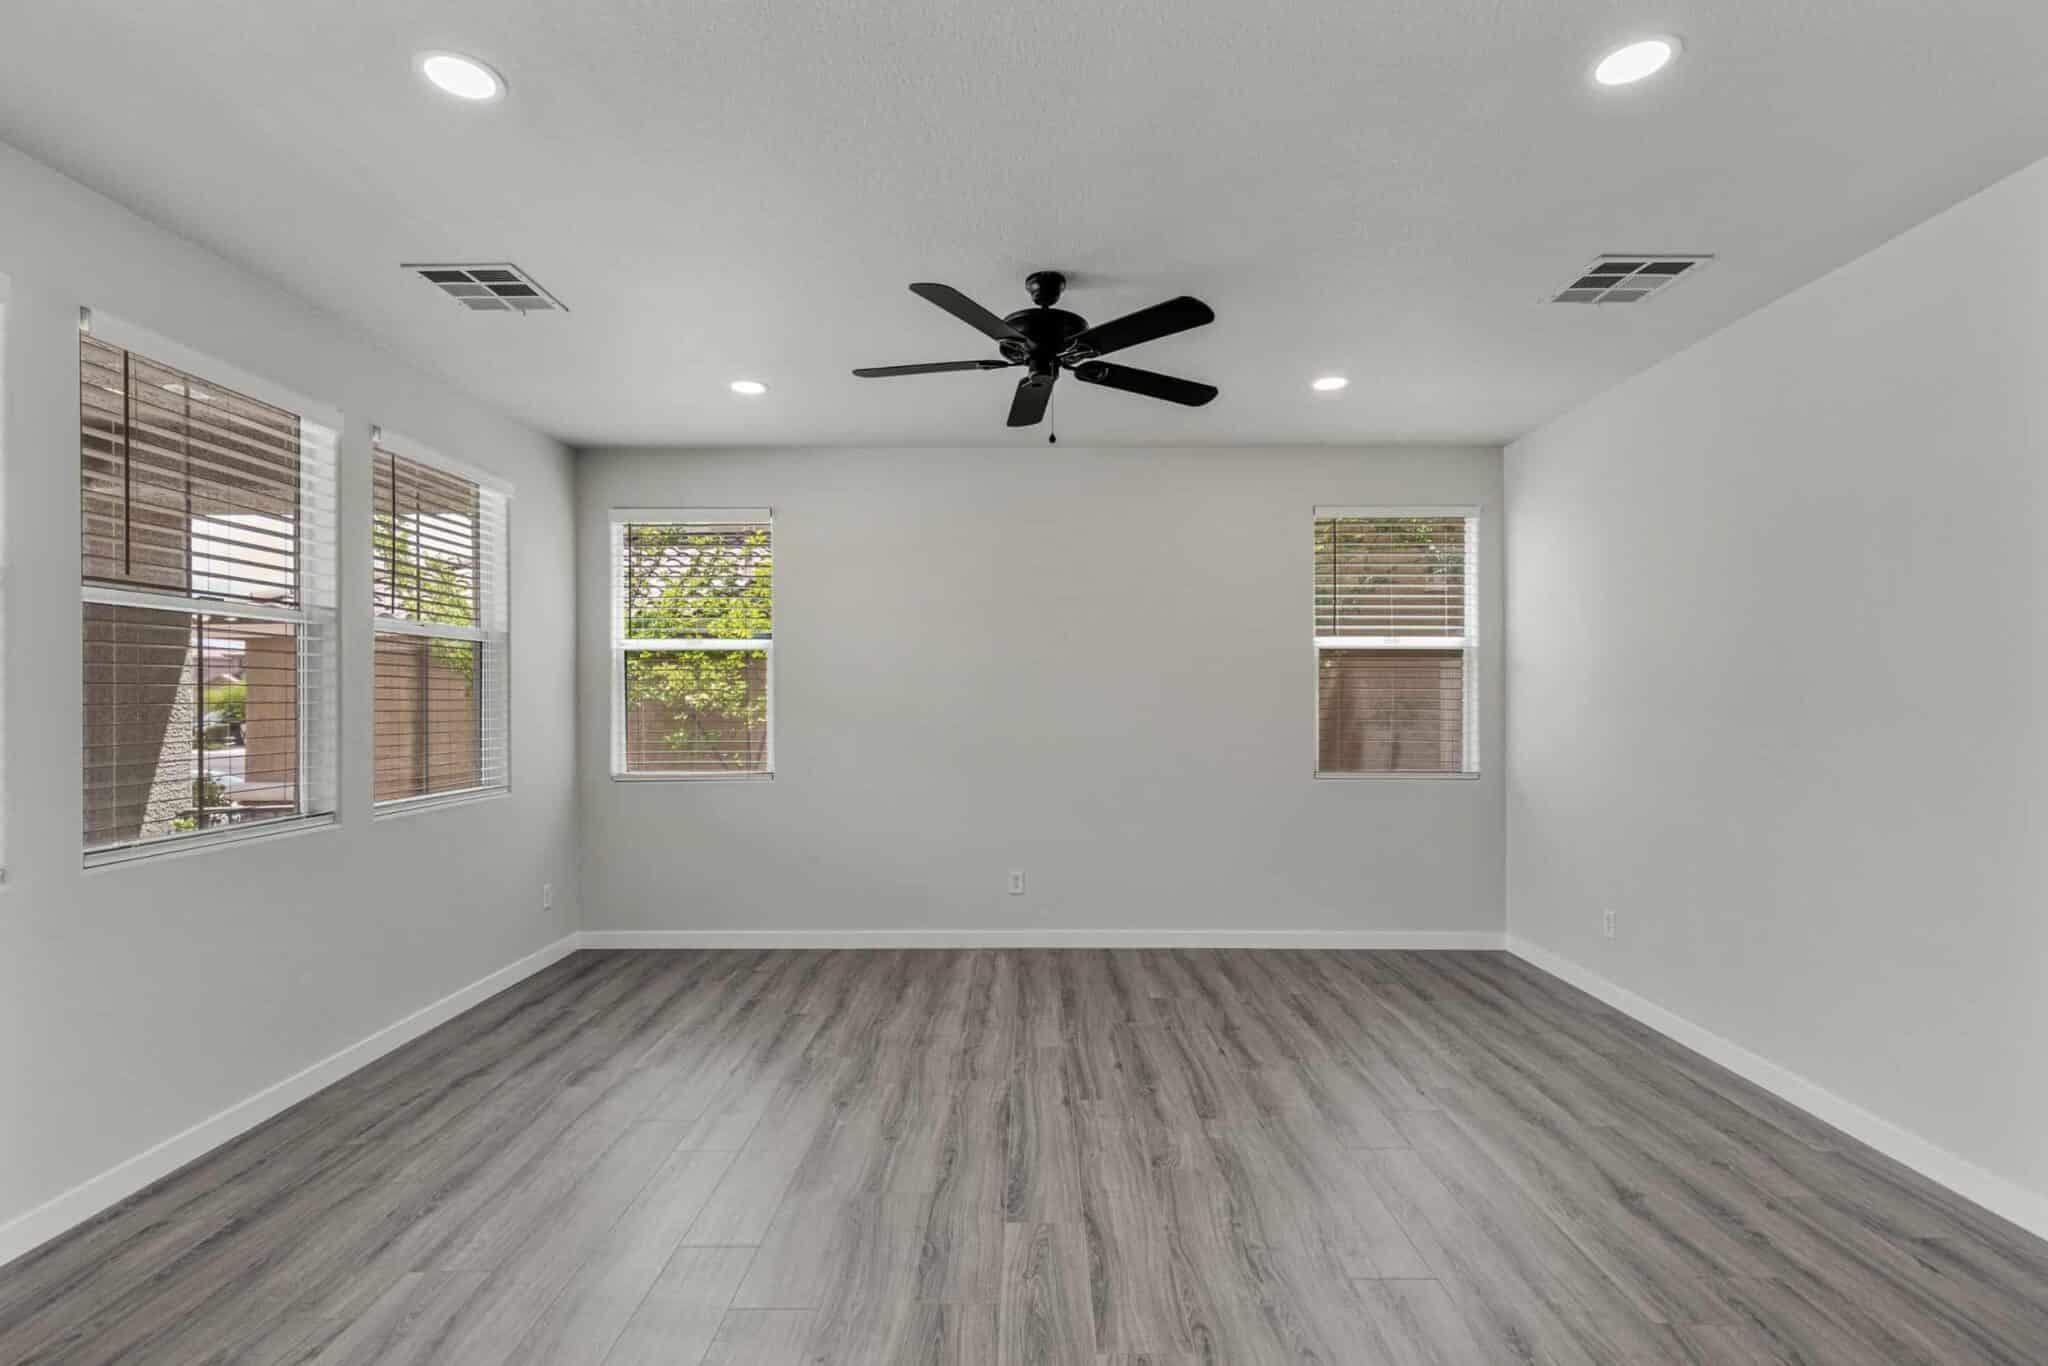 las-vegas-luxry-real-estate-realtor-rob-jensen-company-10491-haywood-drive-summerlin06